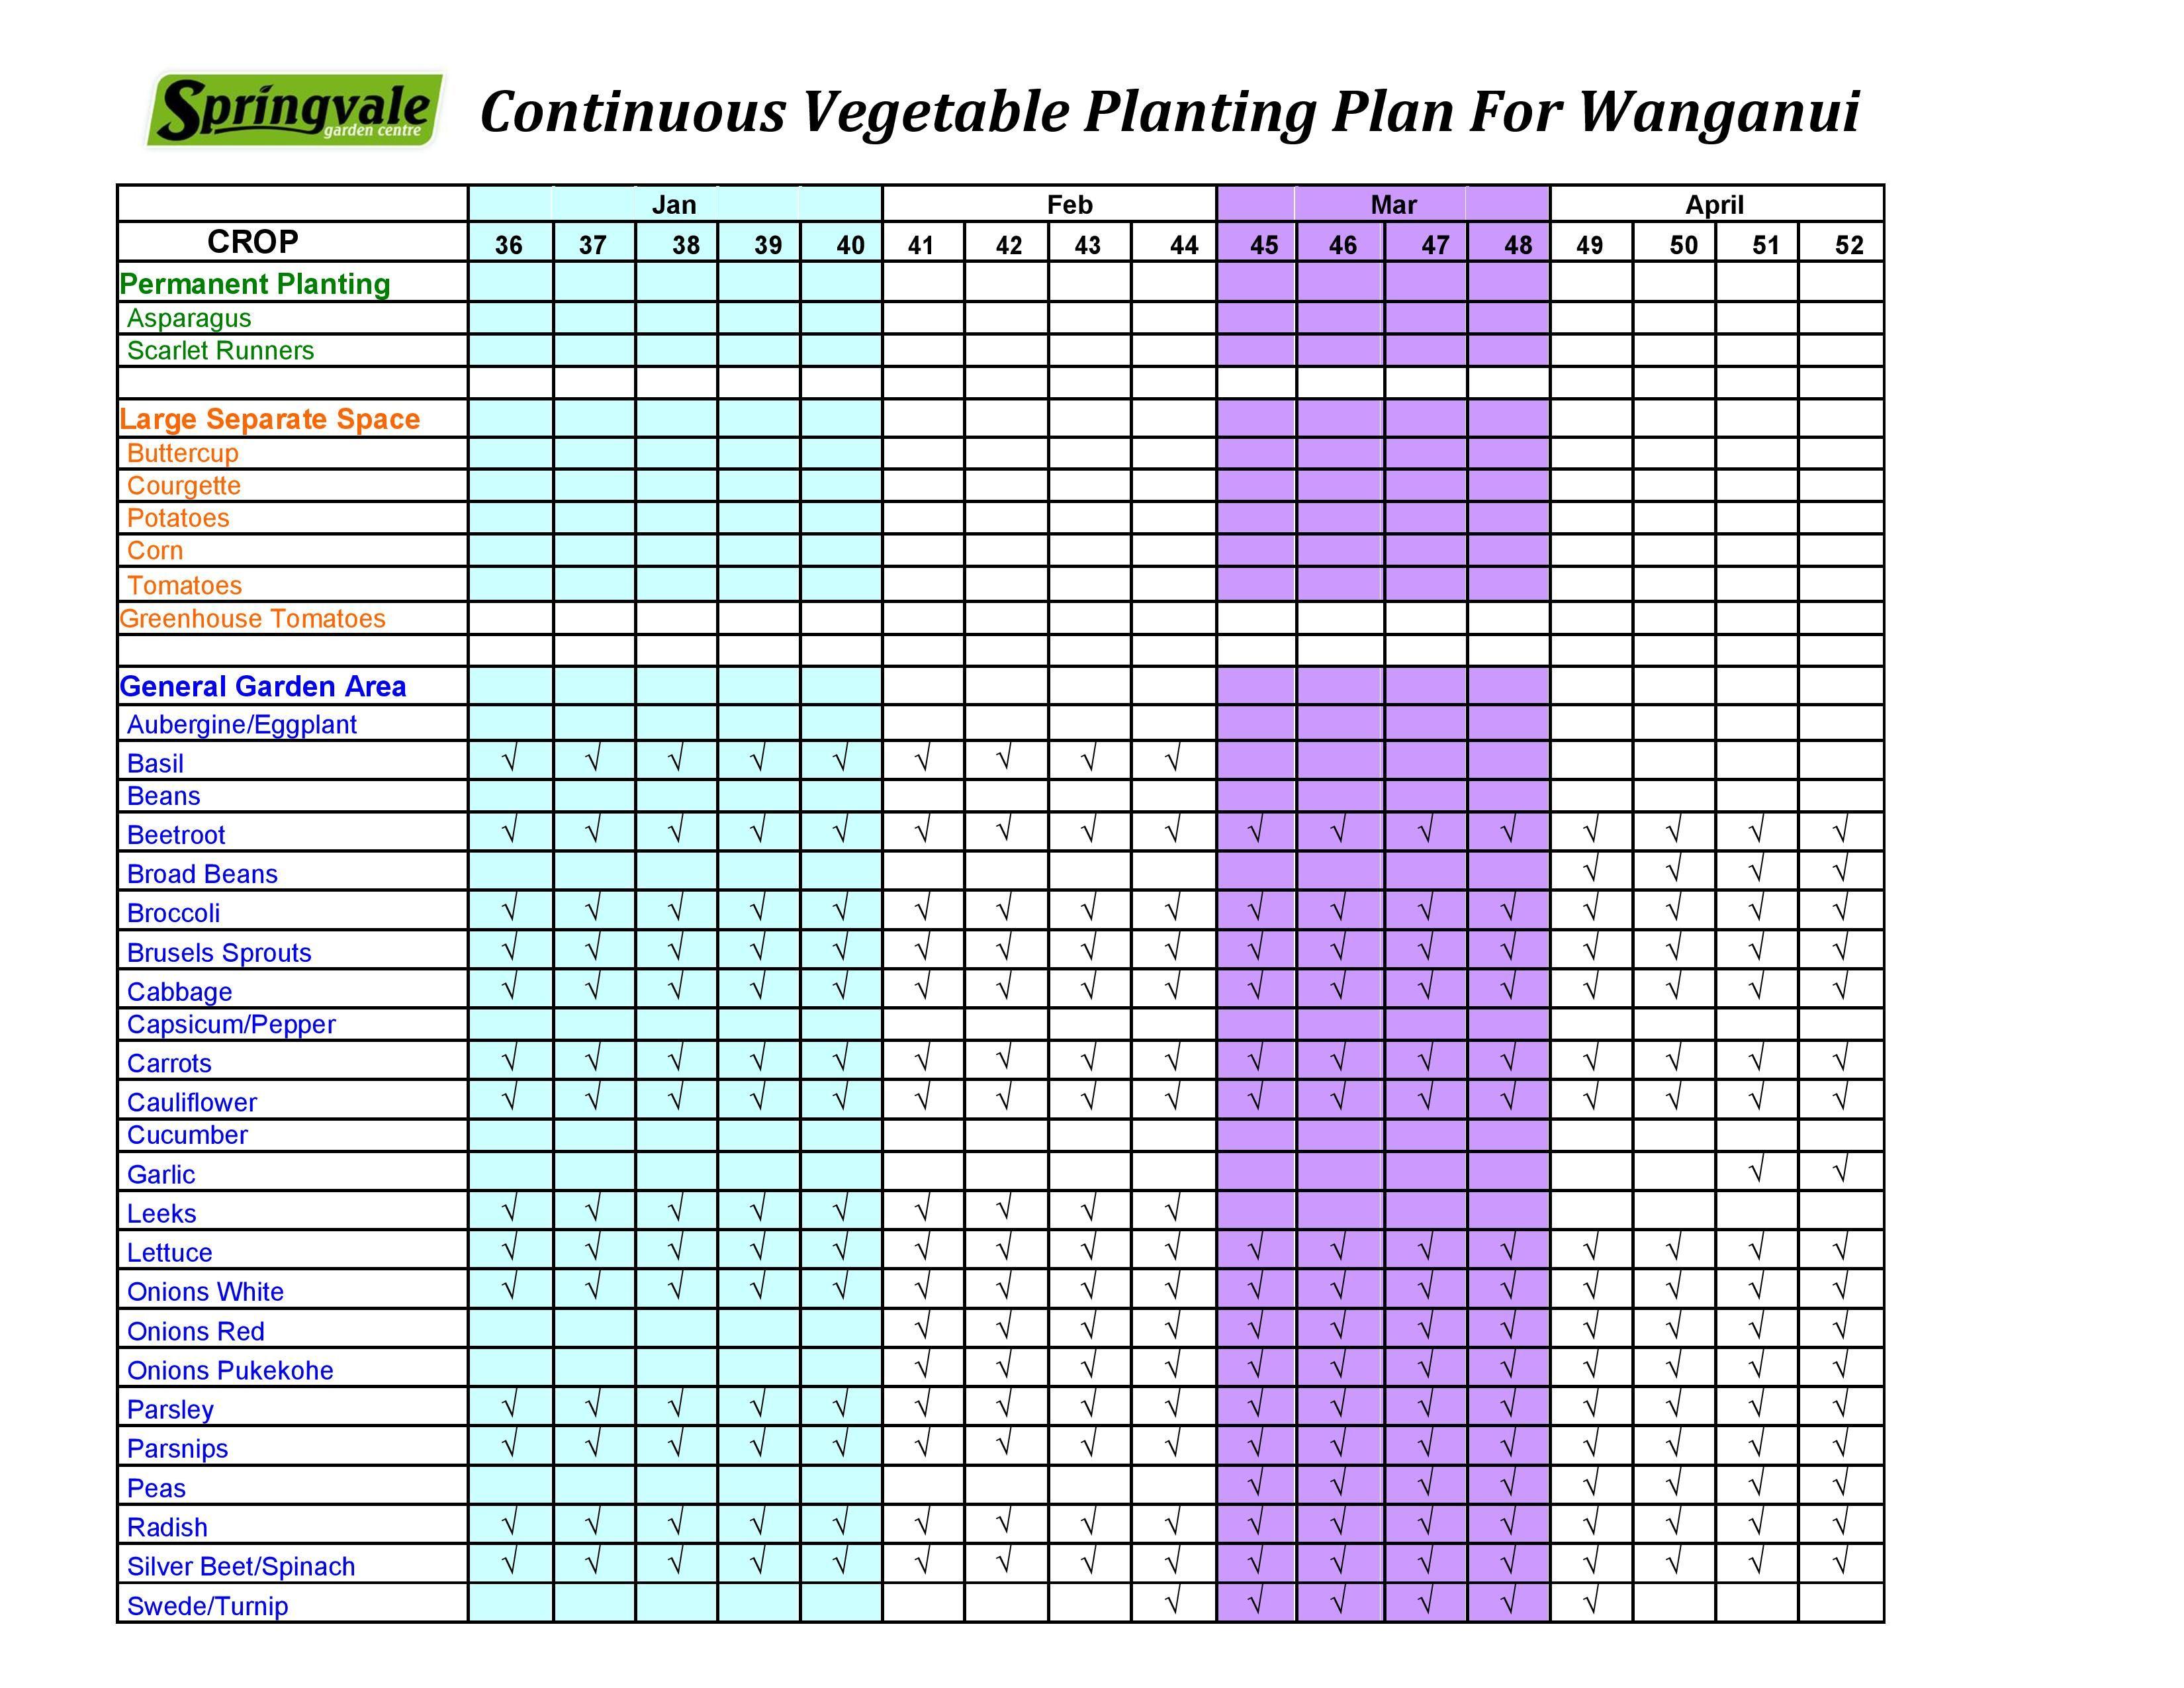 Springvale Garden Centre Continuous Vegetable Planting Plan For